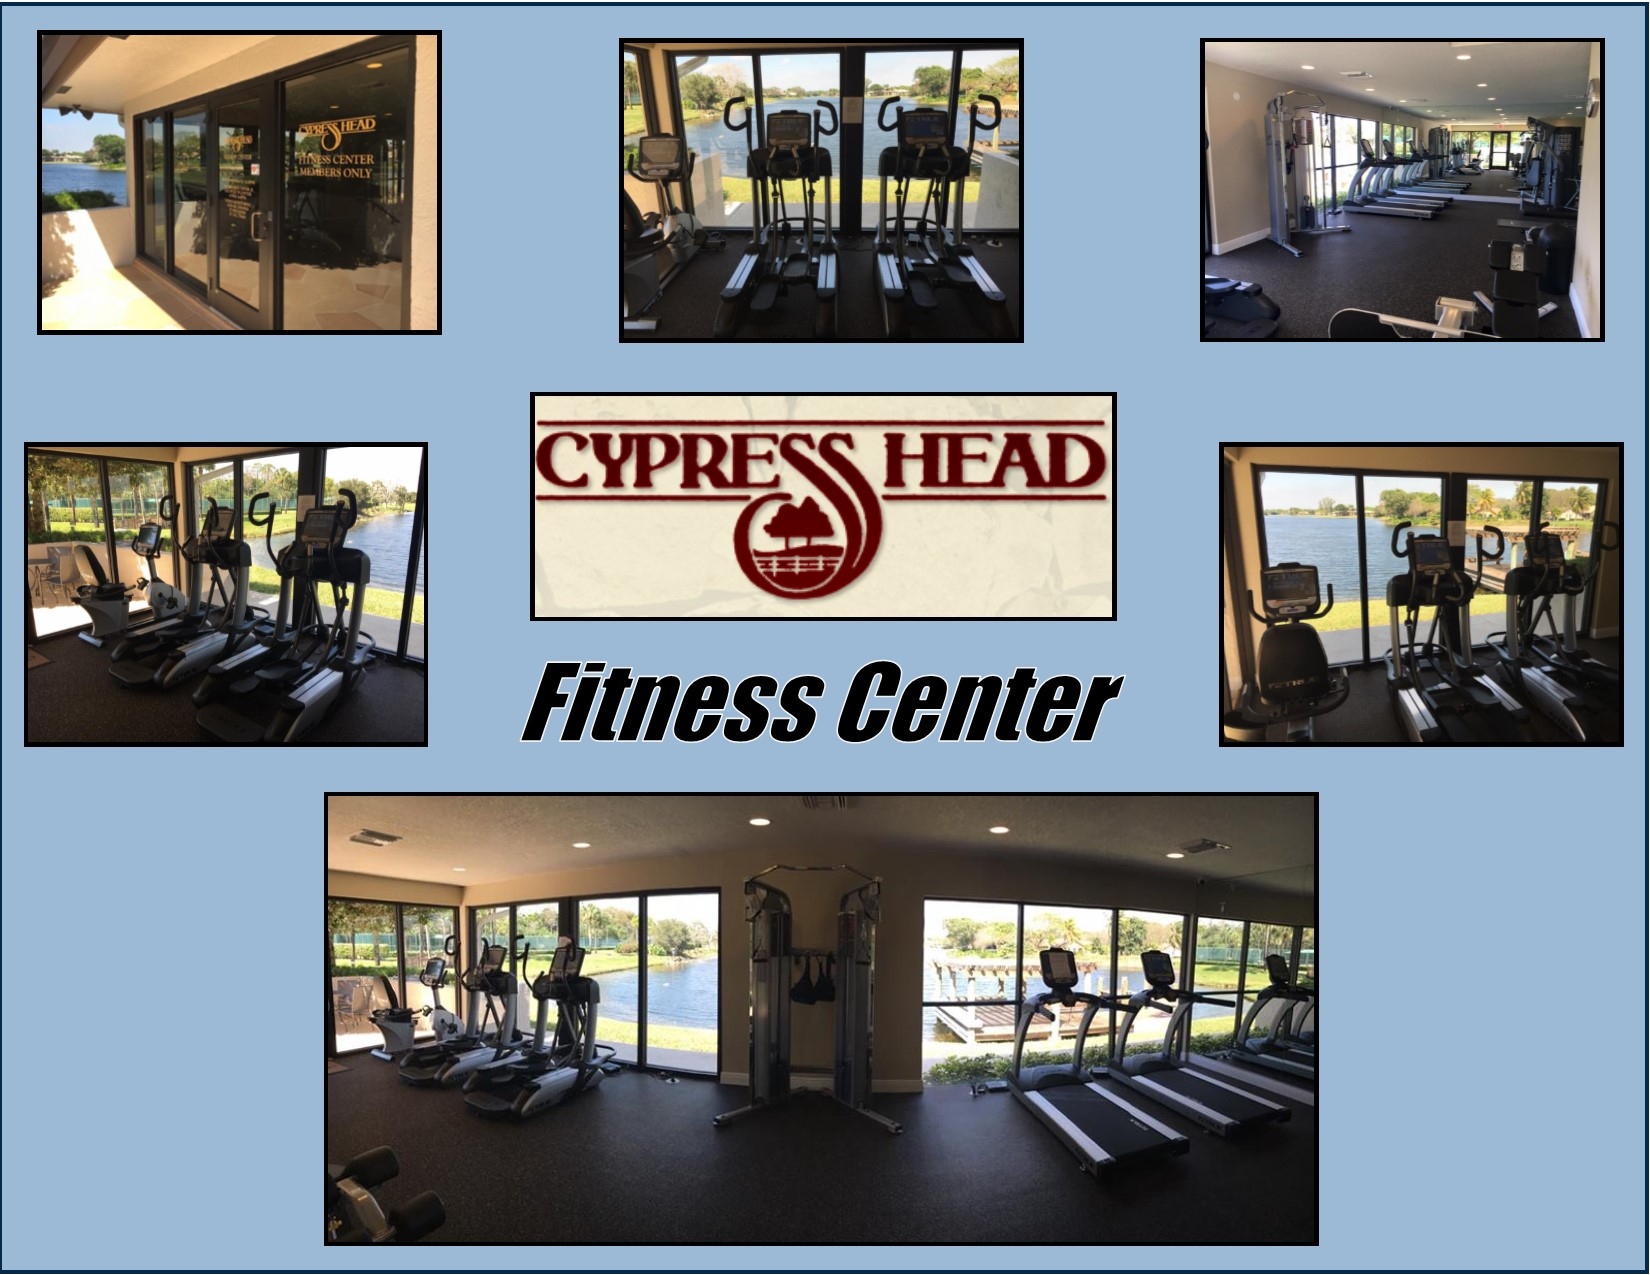 Cypresshead Fitness Center Nop Open!